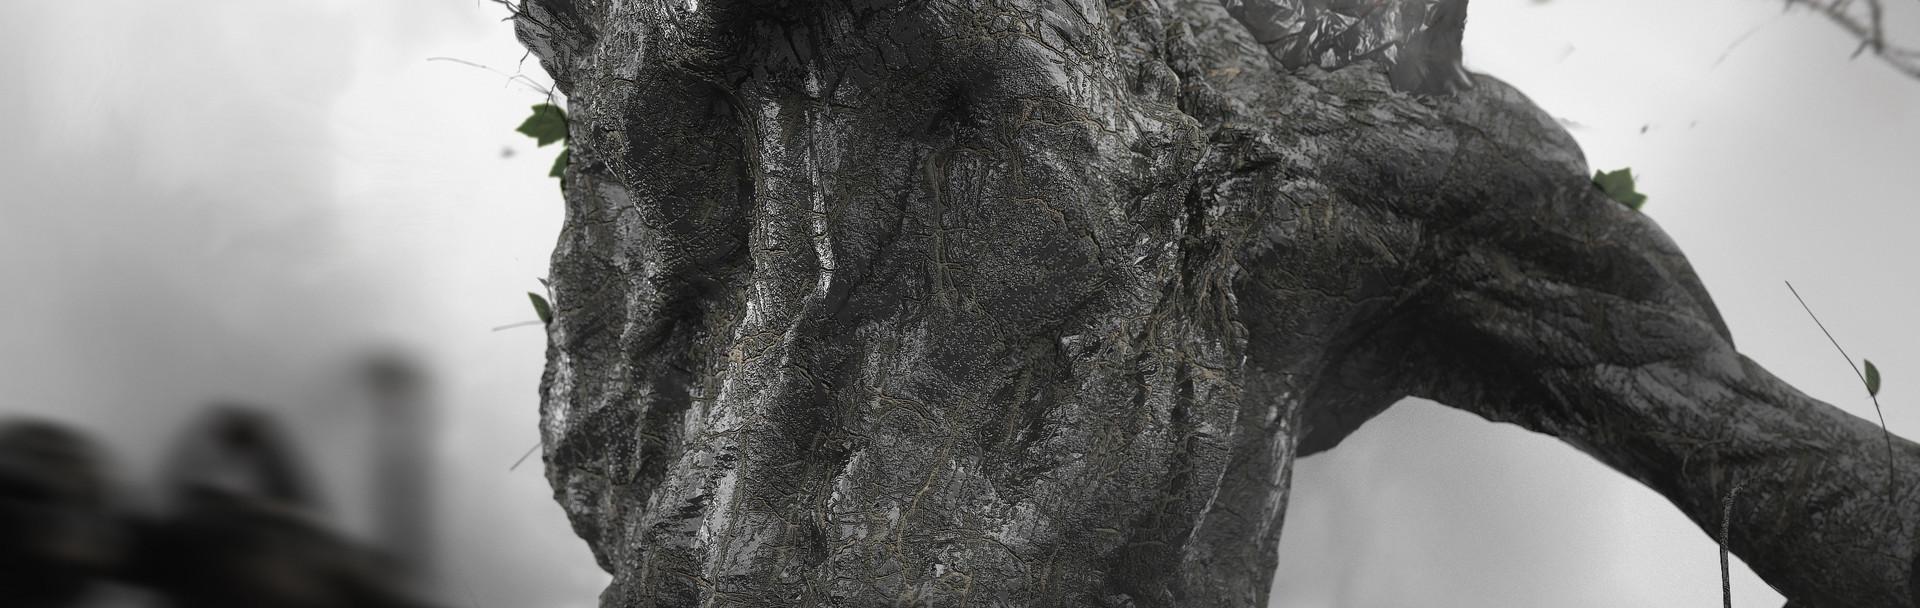 Andrea chiampo mud monster birth a detail